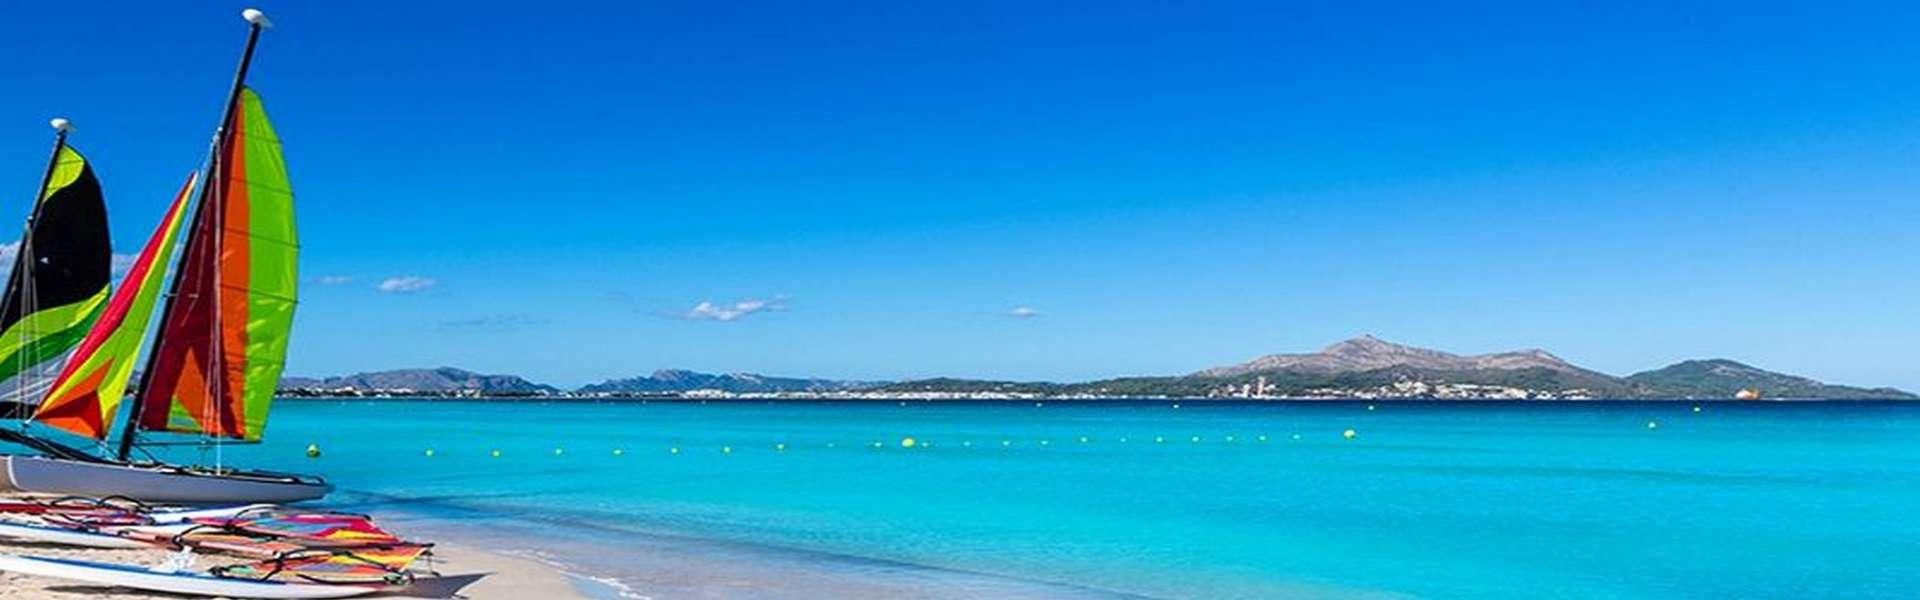 Colònia de Sant Pere - Detached luxury villas with sea views near the beach